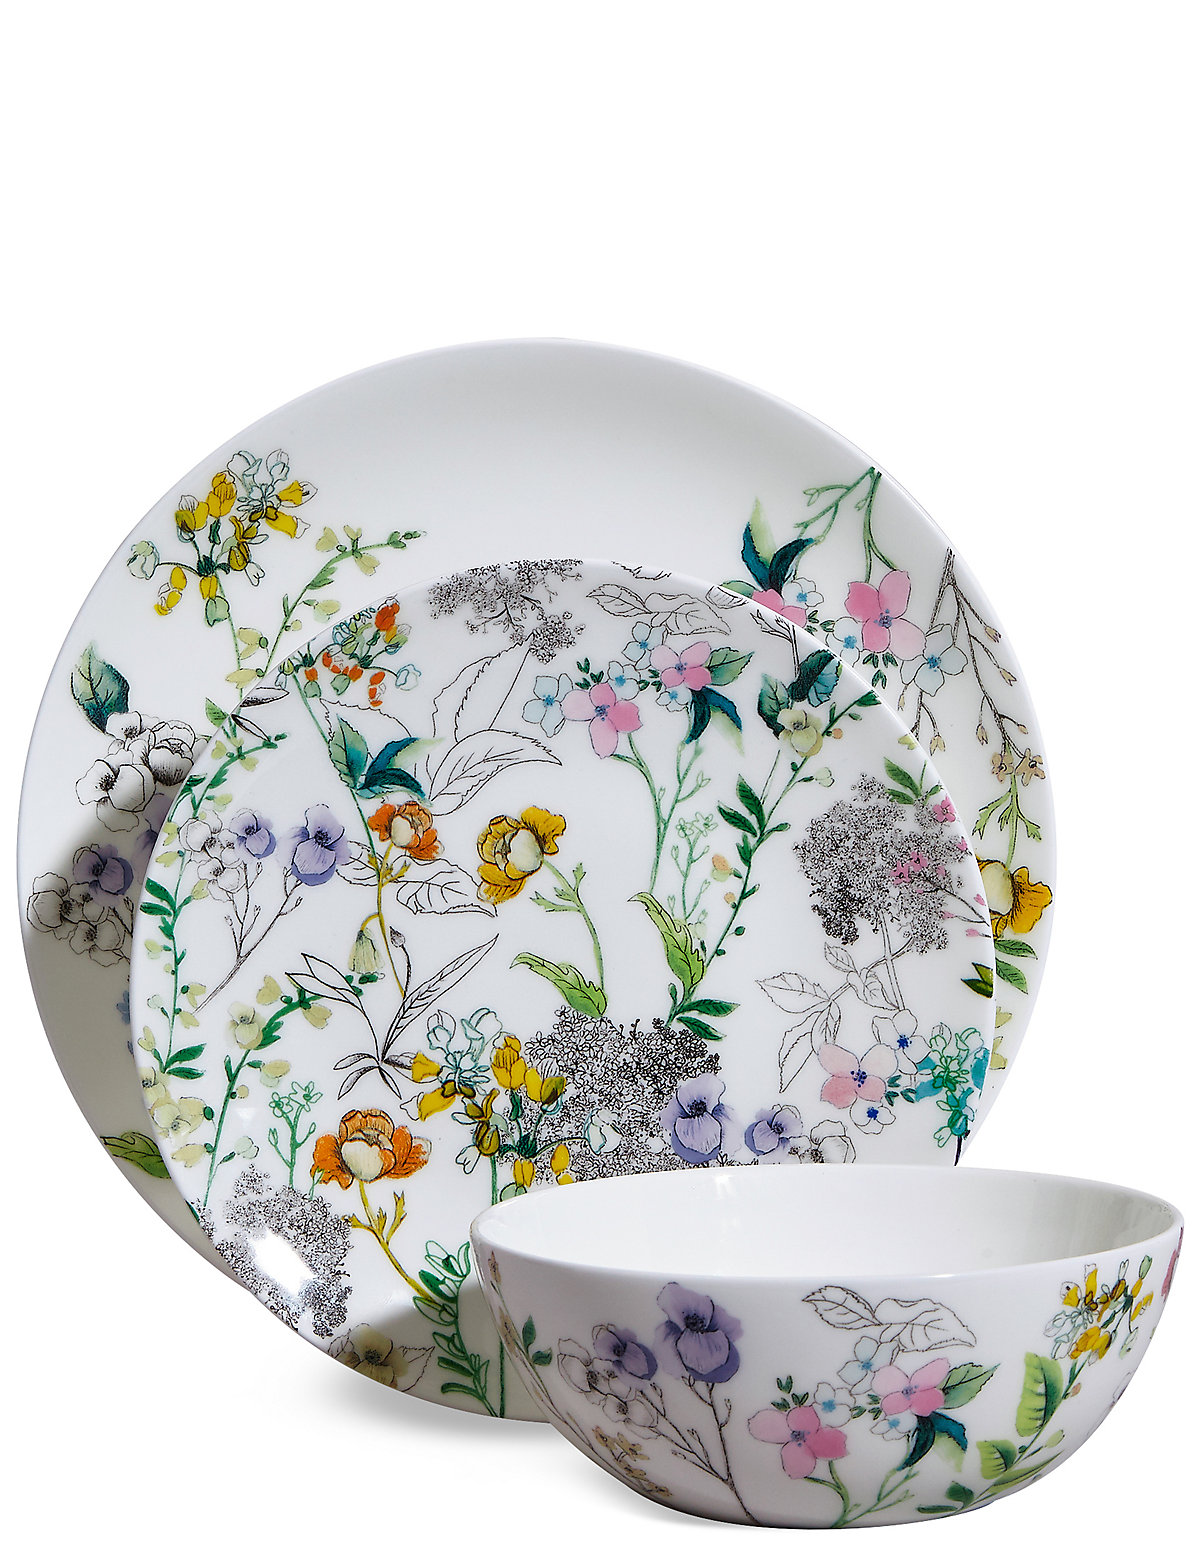 Image of 12 Piece Spring Blooms Dinner Set